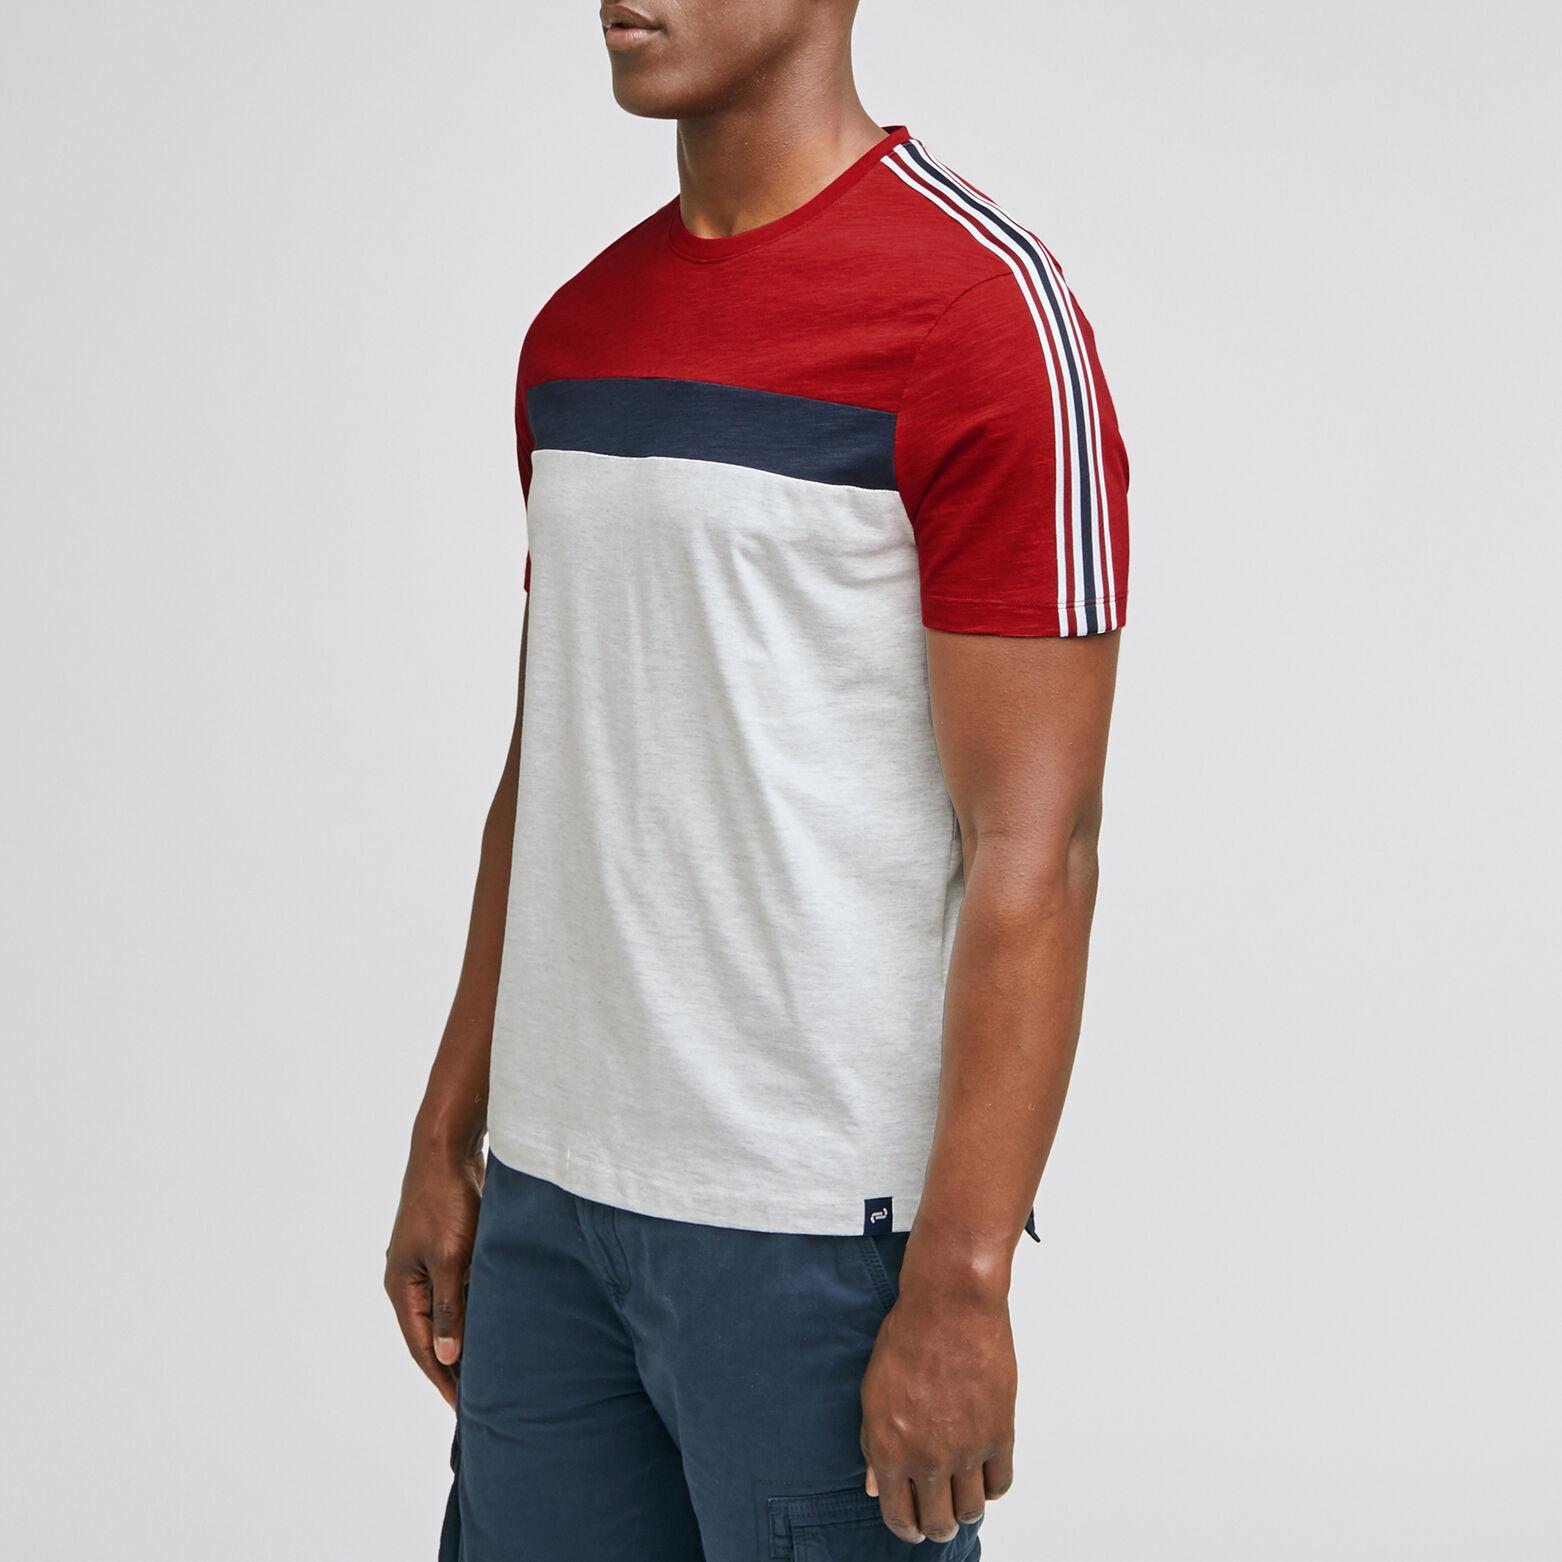 Tee-shirt colorblock bande manche coton issu de l'